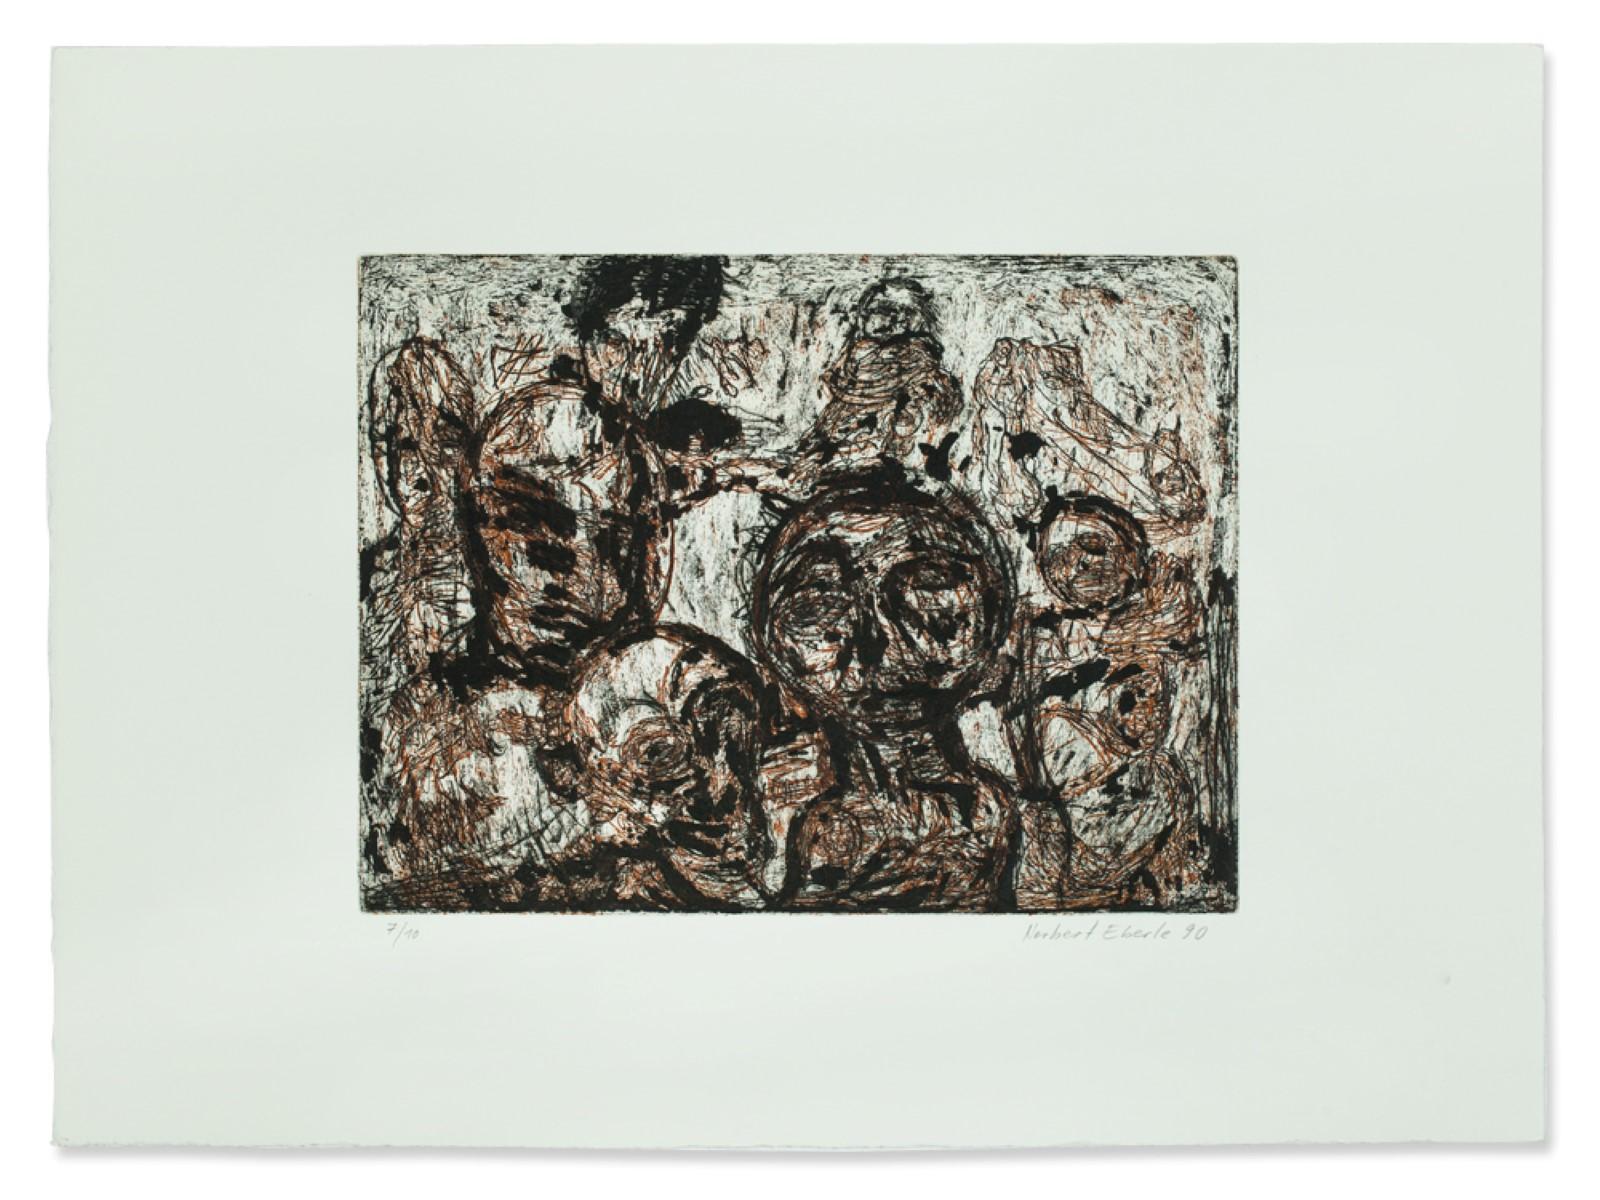 #87 Norbert Eberle (1954) color etching, heads, 1990   Norbert Eberle (1954), Köpfe 1990 Image